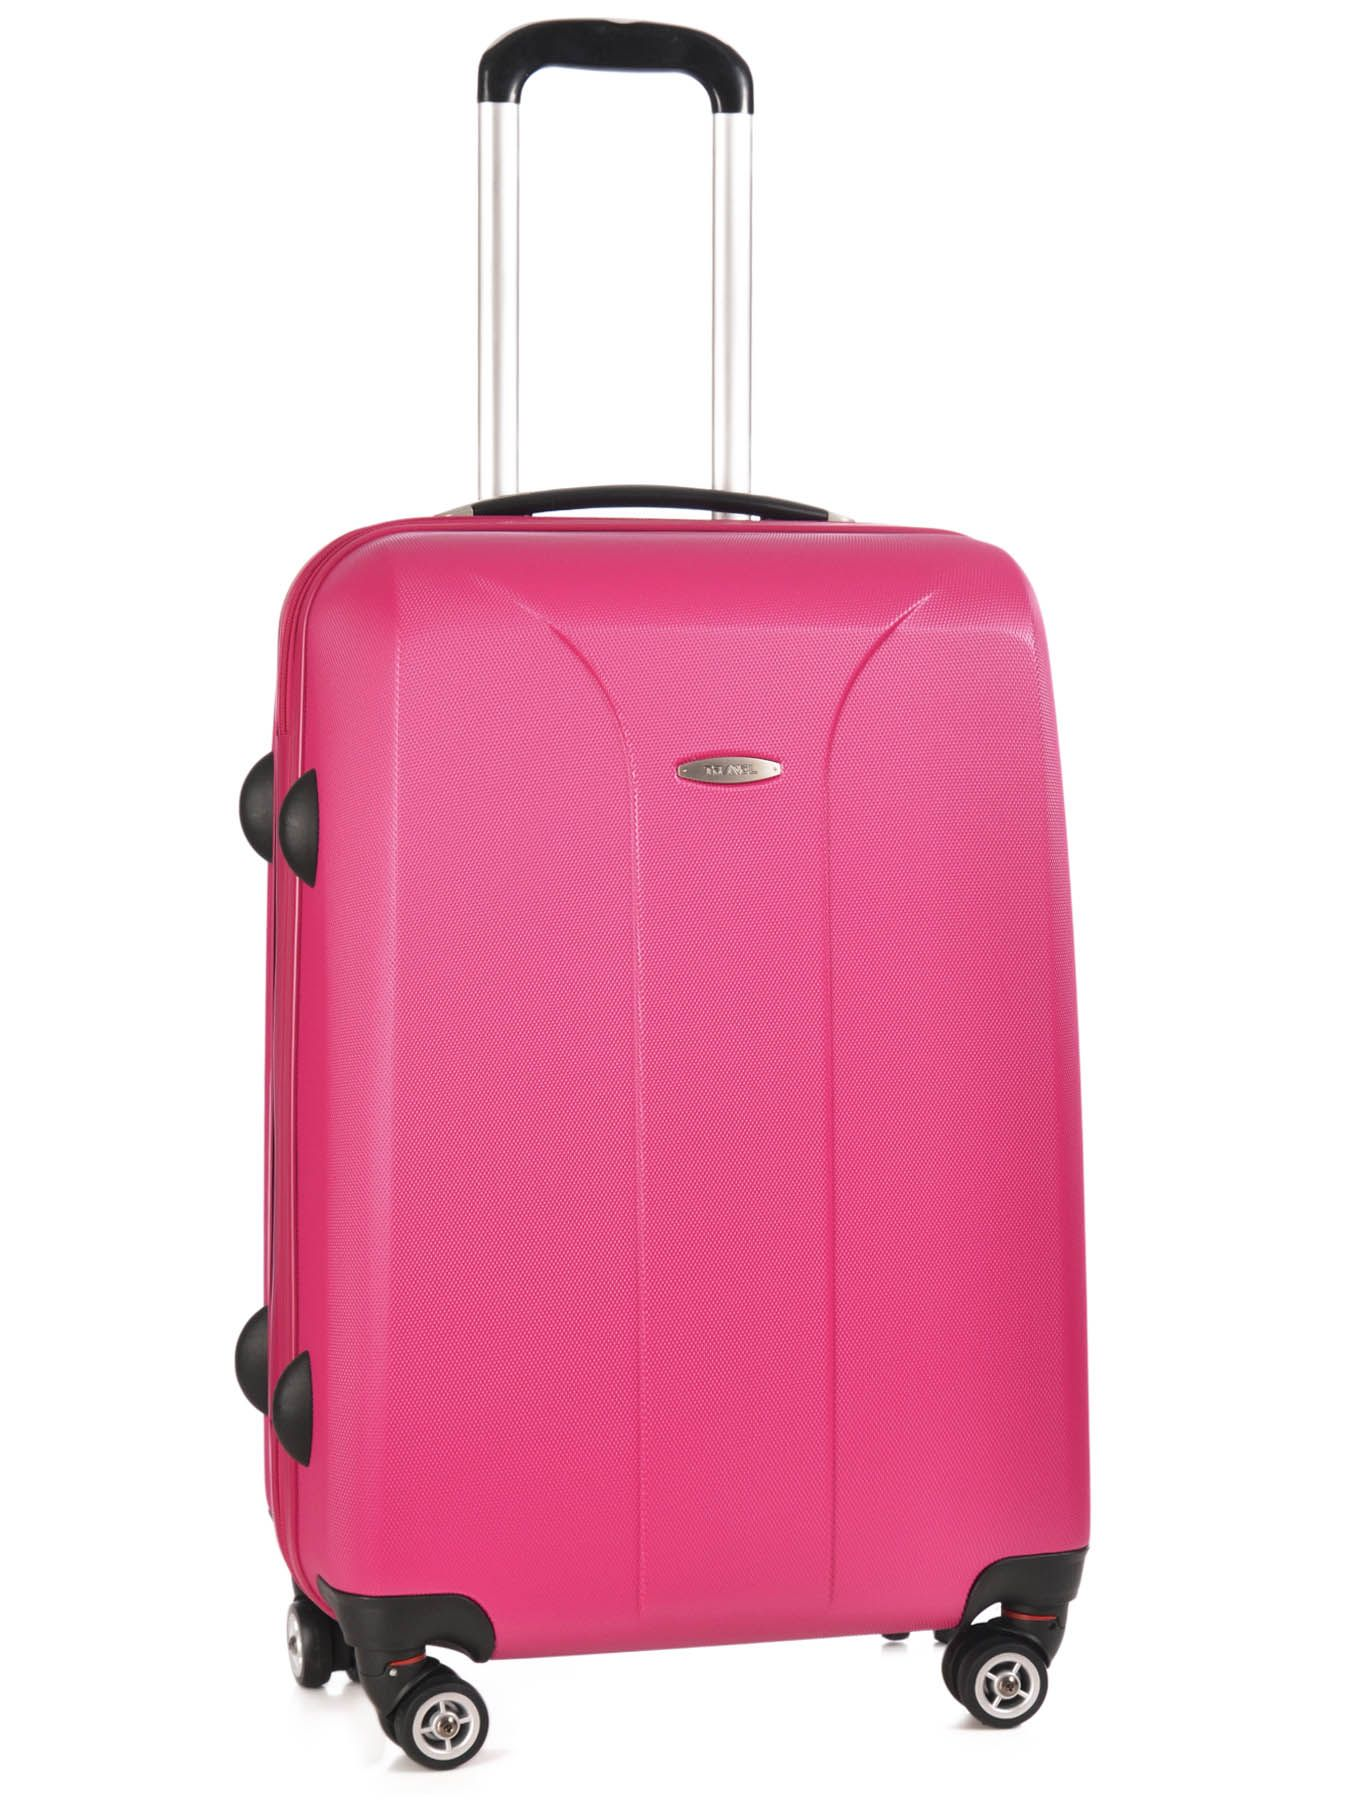 bagages pas chers travel fuschia building ig1302m. Black Bedroom Furniture Sets. Home Design Ideas